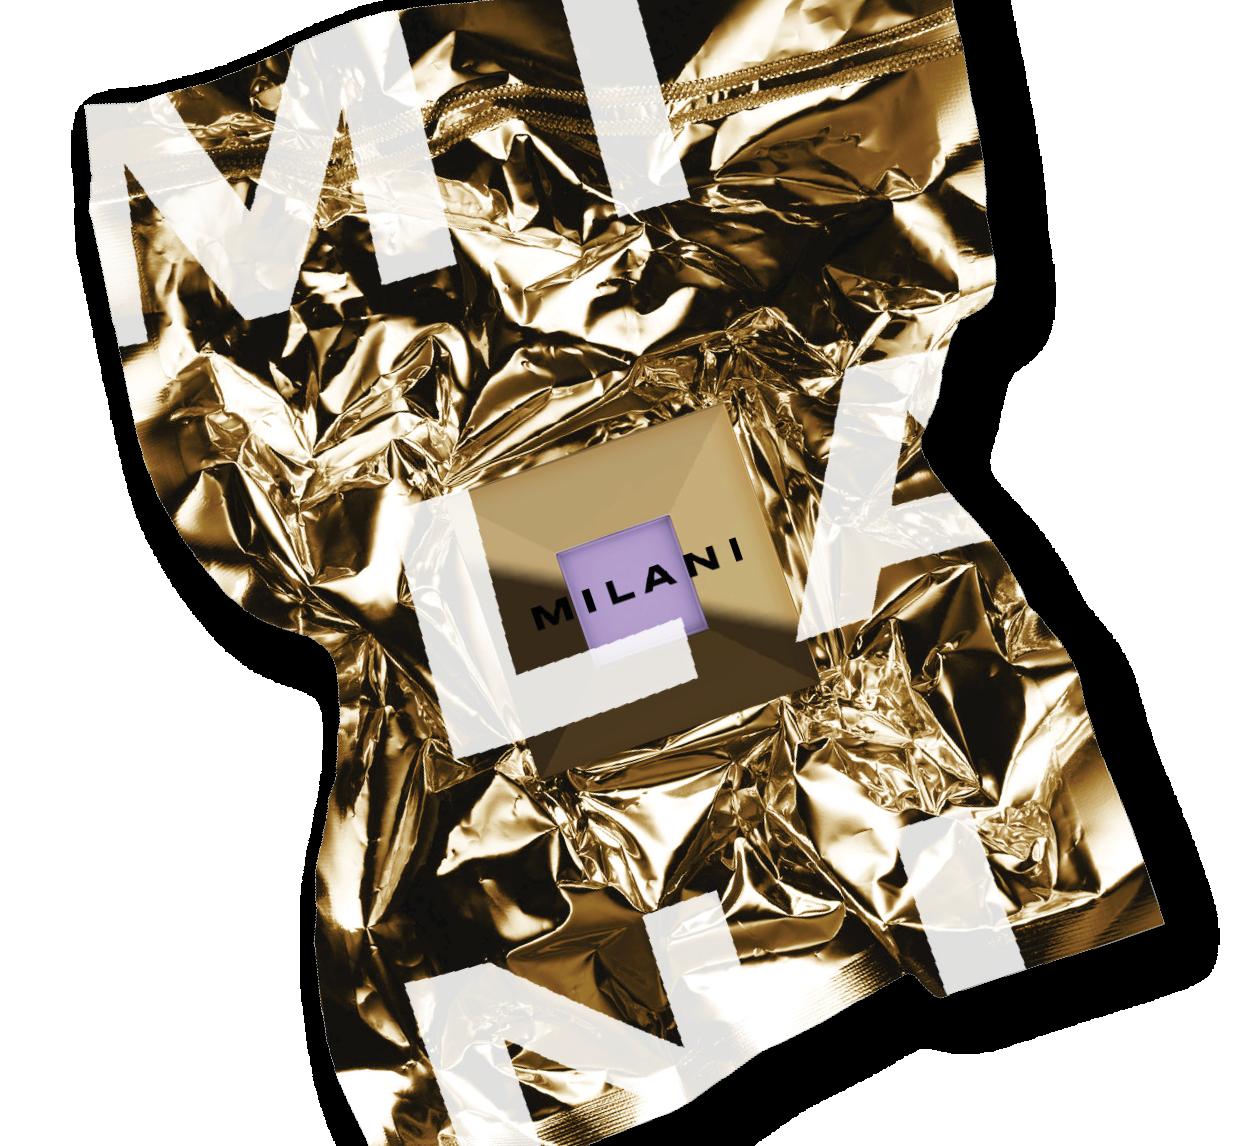 Milani Cosmetics5.png